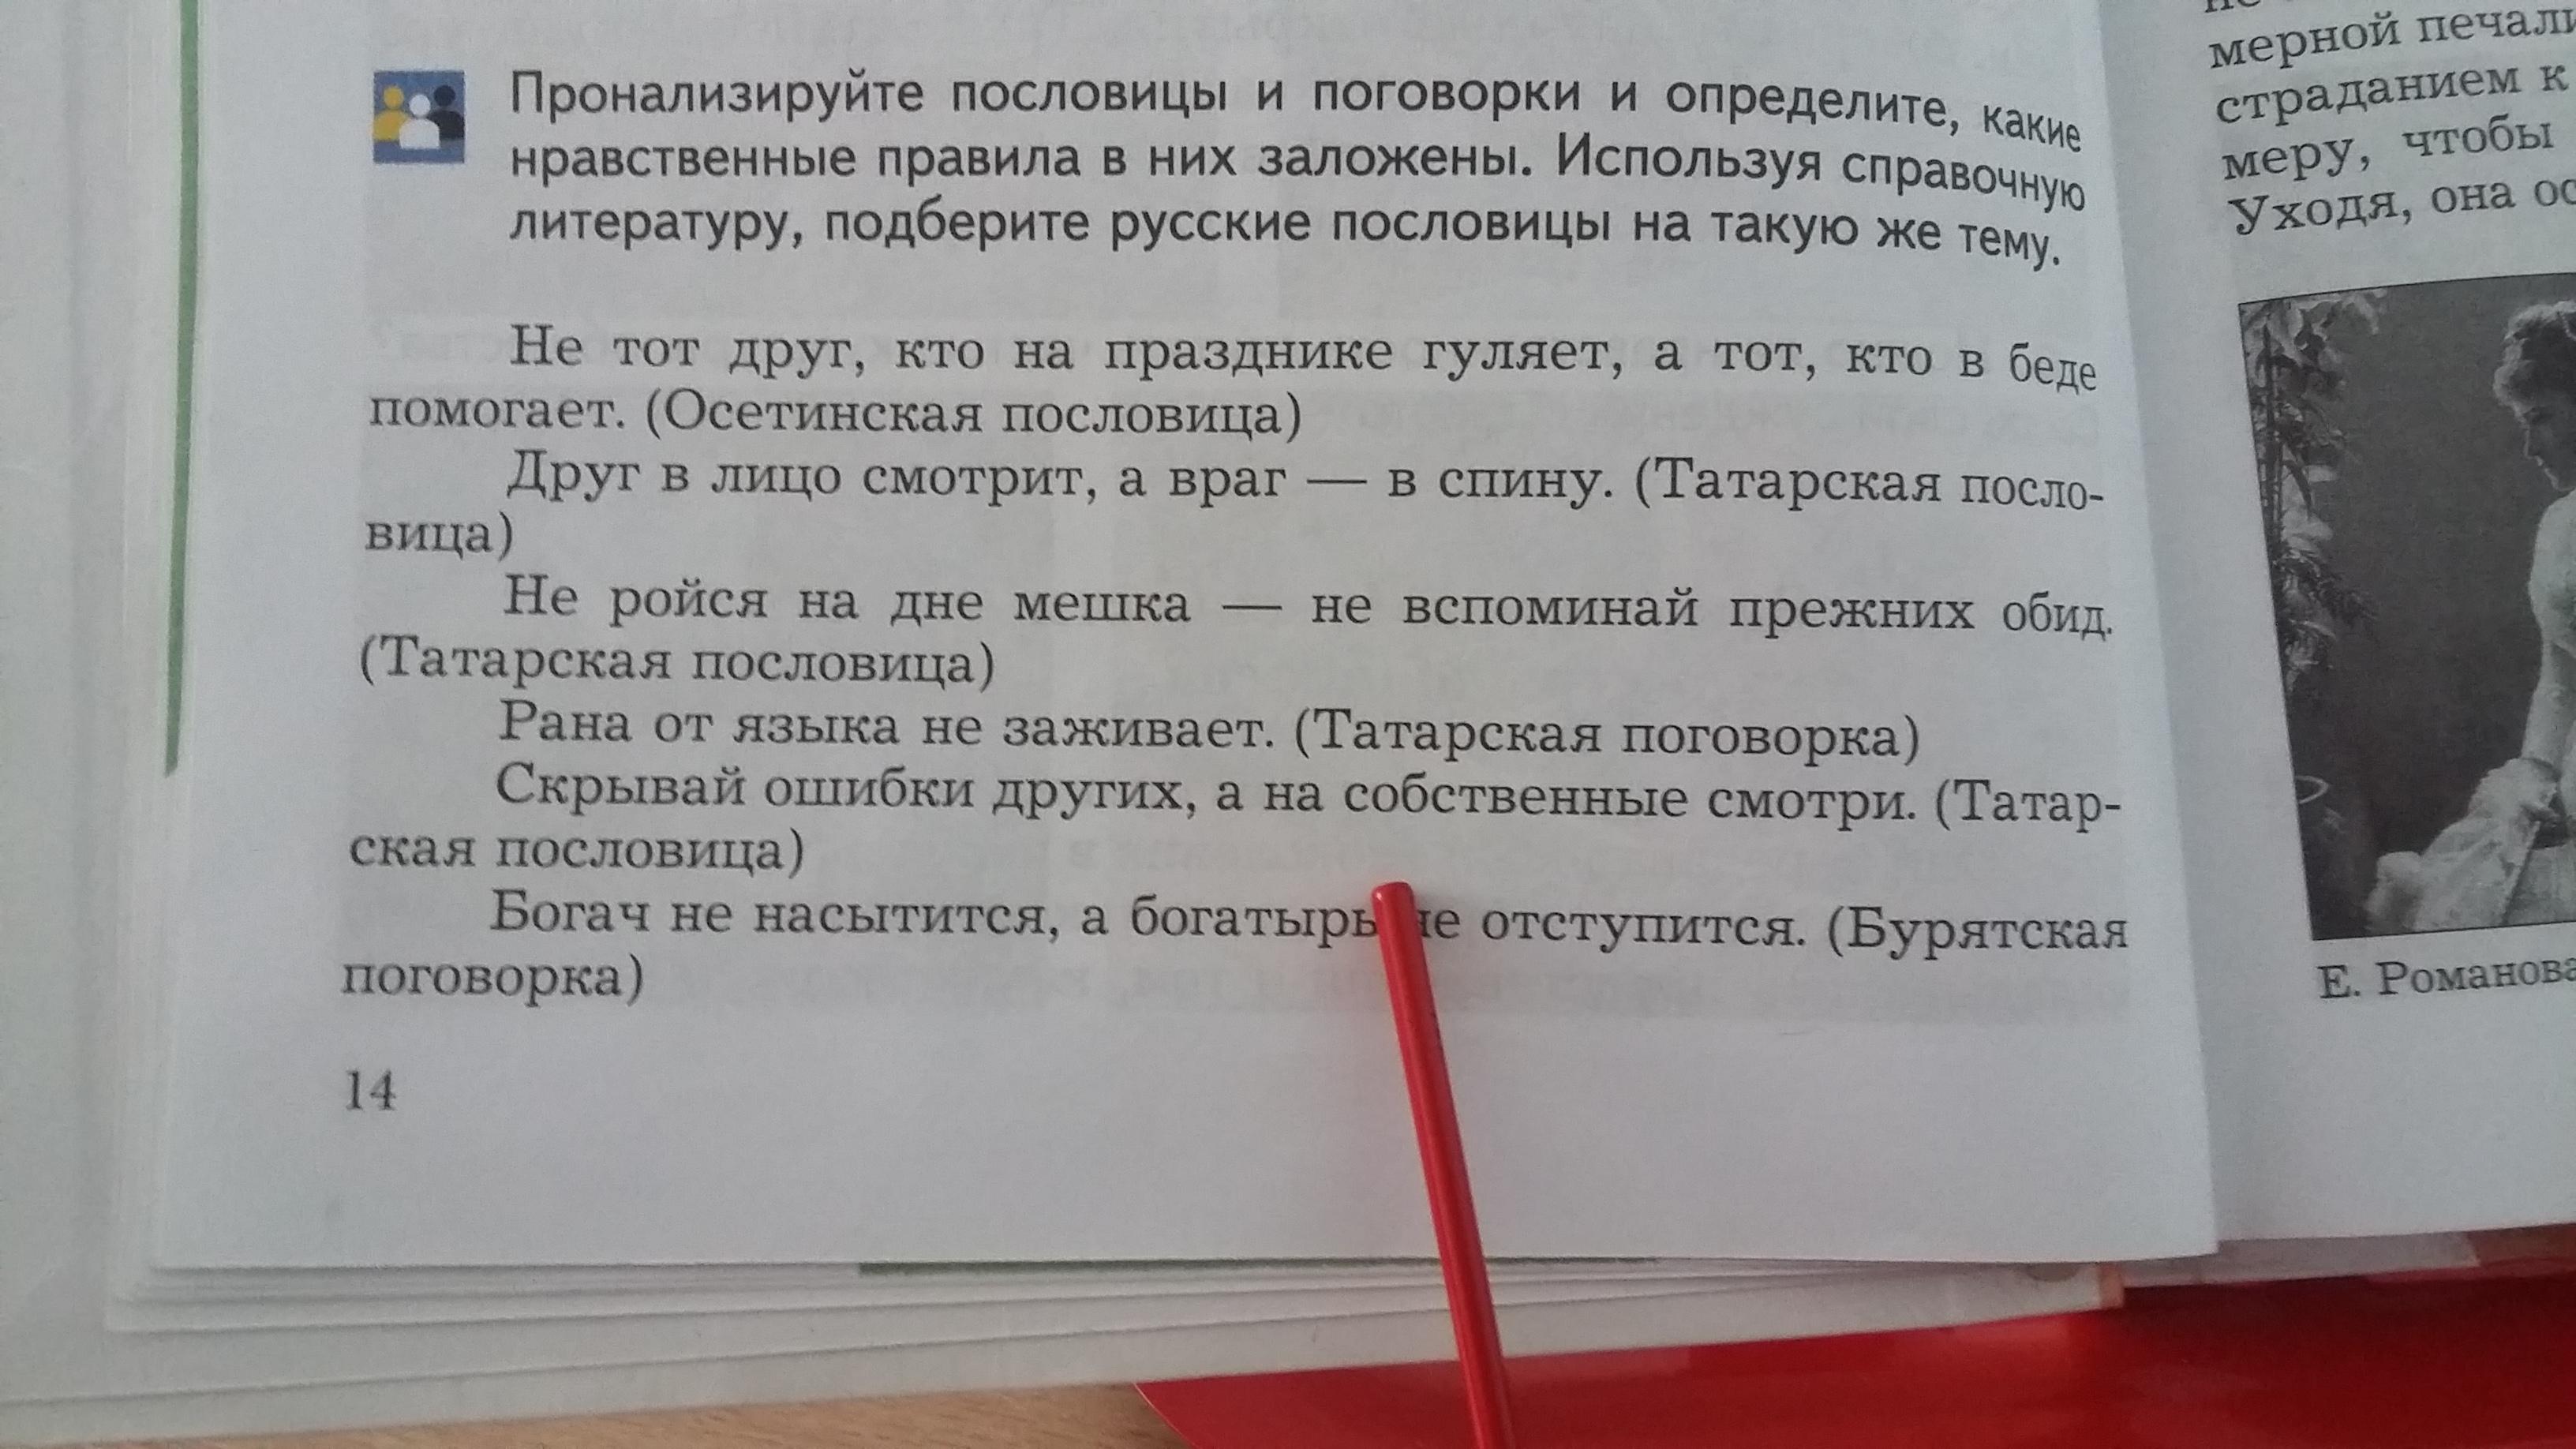 Пословицы на бурятском языке